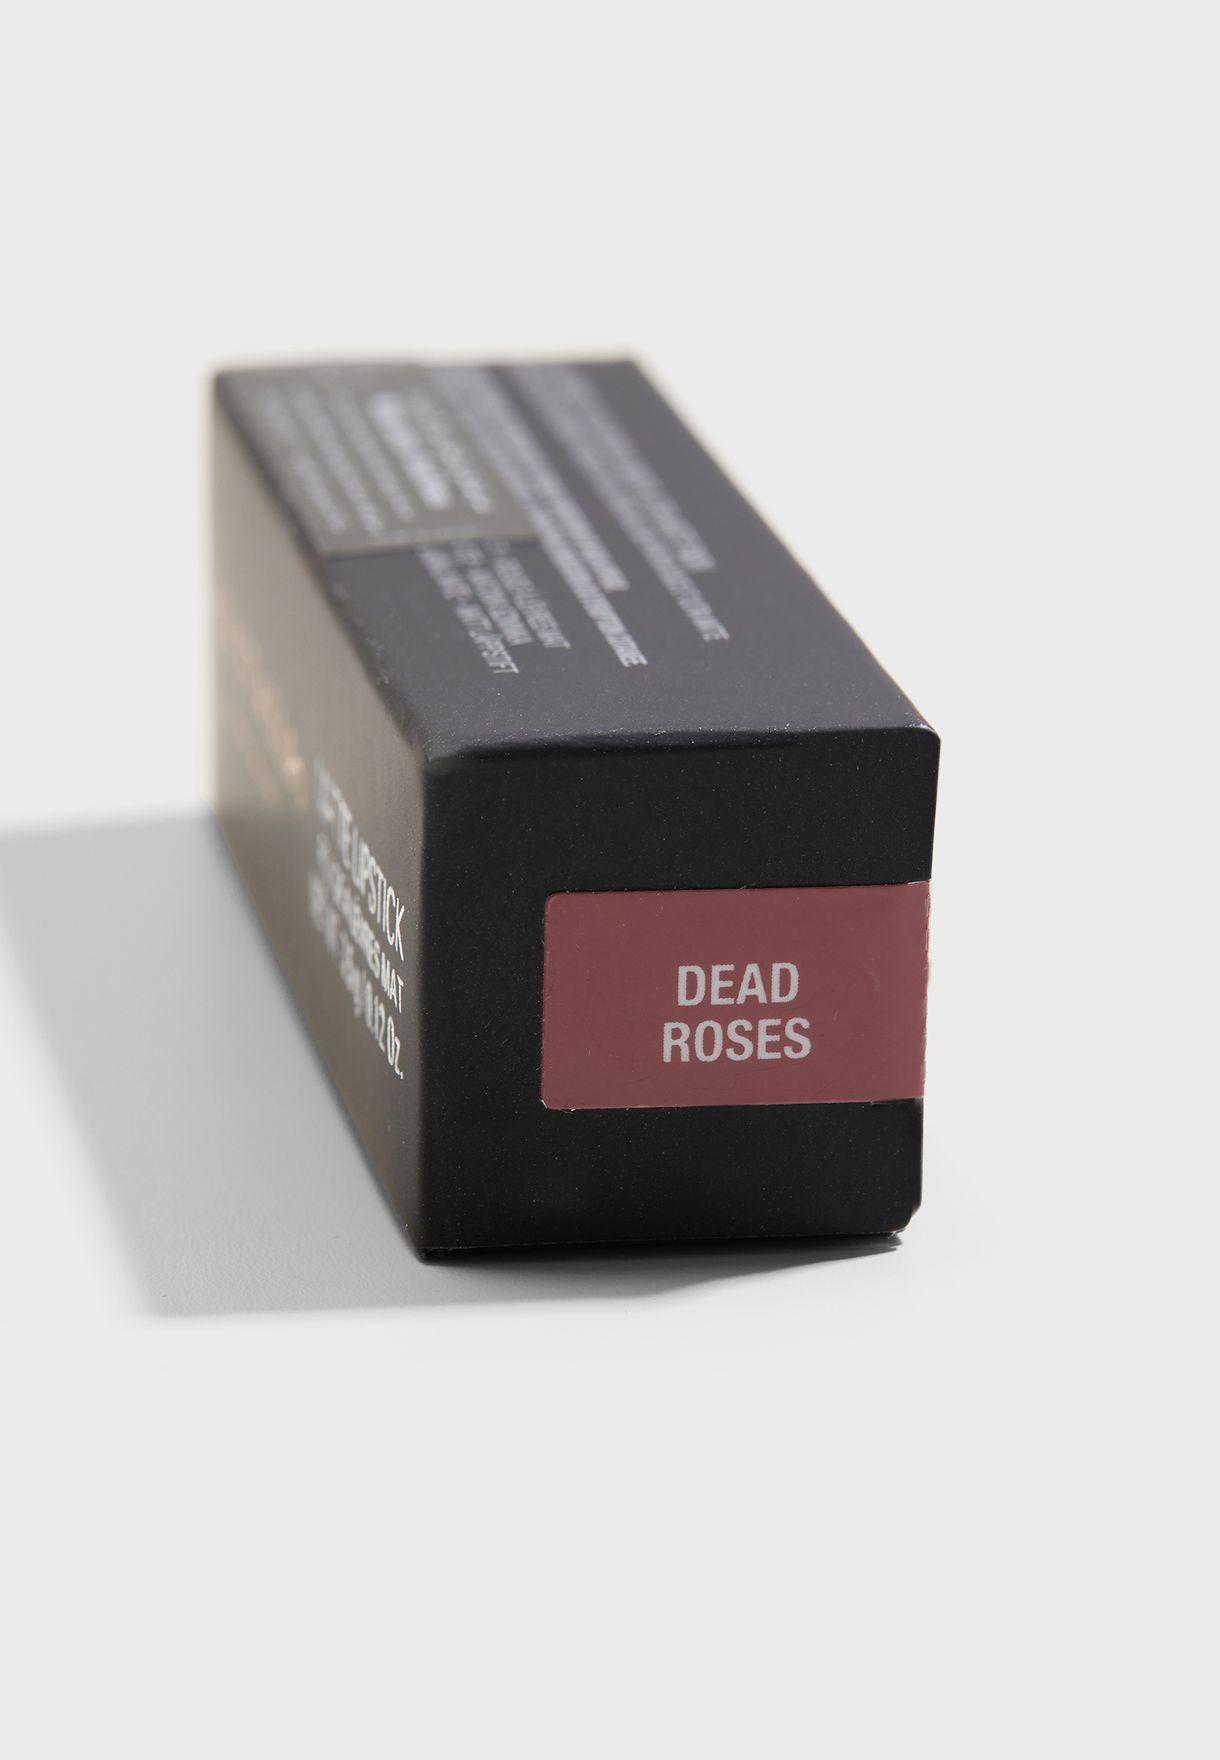 احمر شفاه مطفي - ديد روزيس